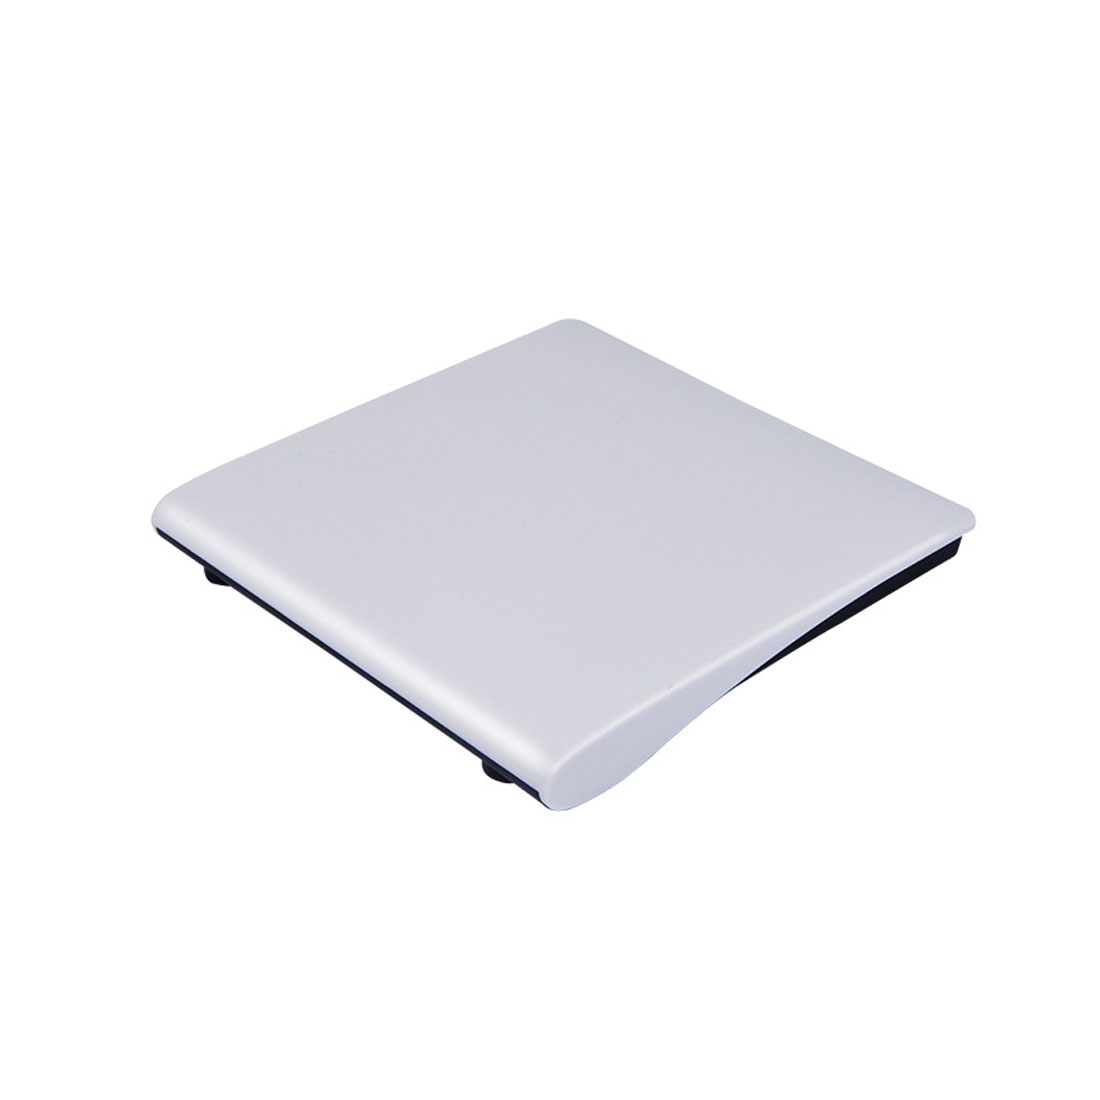 New White External Optical Disk Drive Case Box USB 3.0 SATA High Speed for Macbook Windows PC Laptop CD/DVD-ROM Optical Box